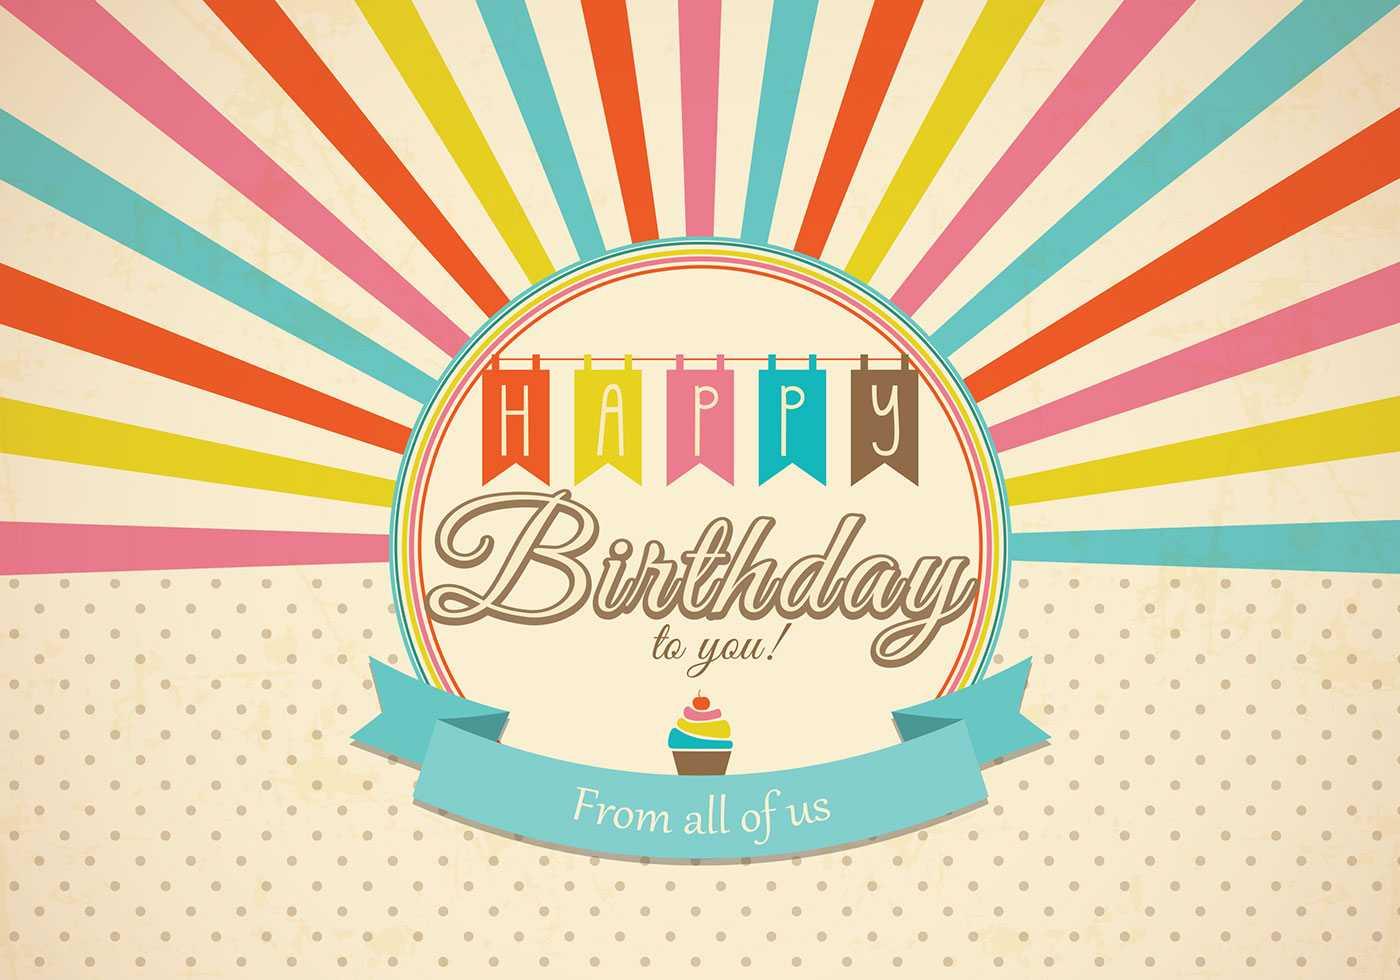 Retro Happy Birthday Card Psd - Free Photoshop Brushes At Regarding Photoshop Birthday Card Template Free